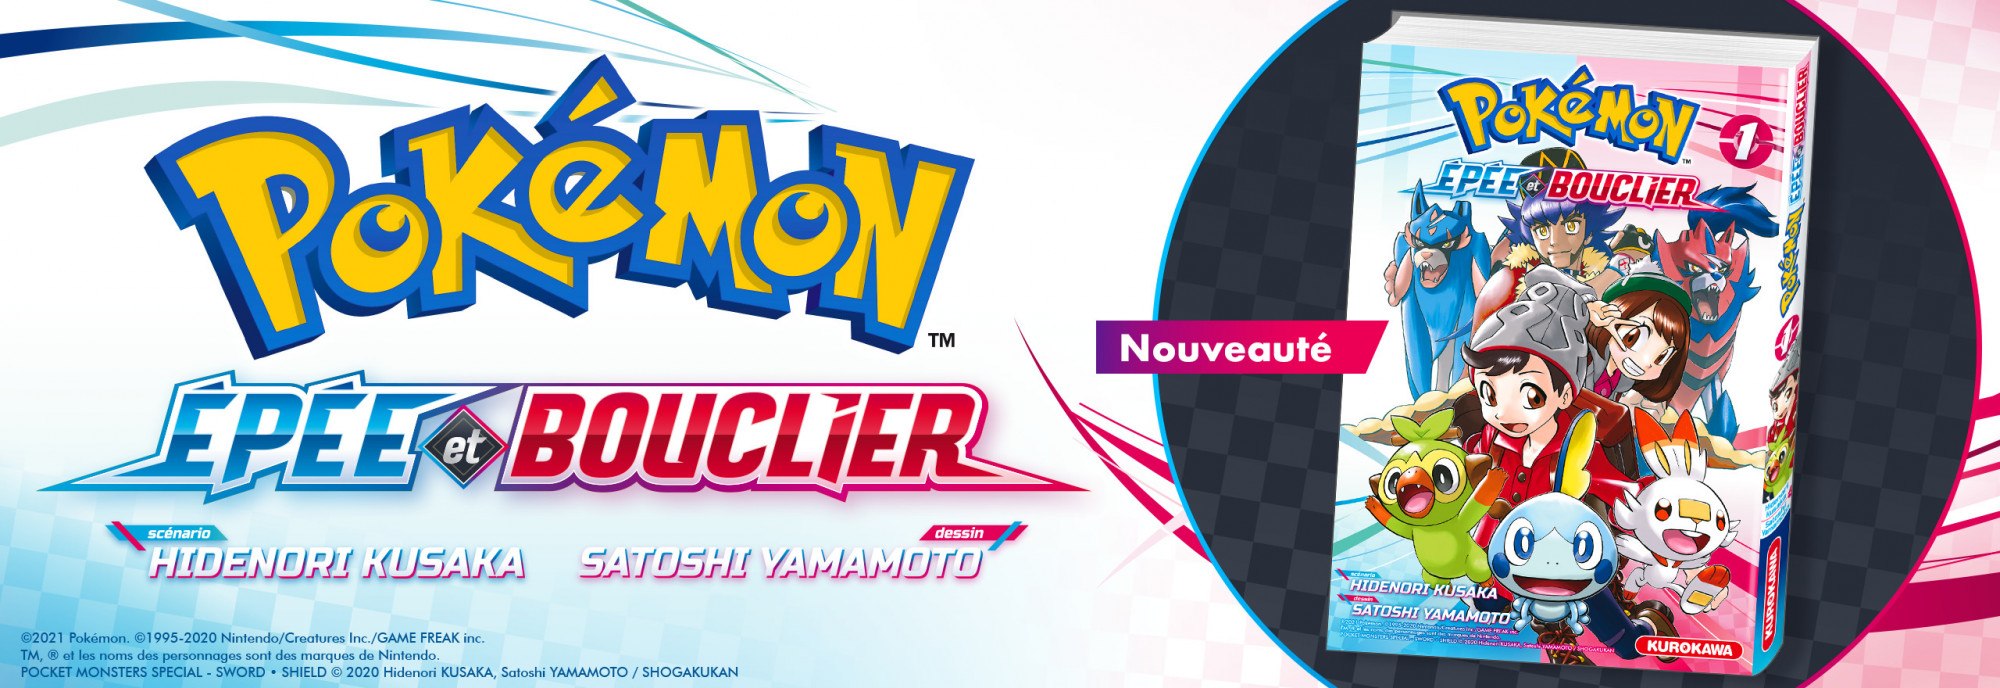 6317_1_Pokemon-Epee-Bouclier-T1-Visuel-Lisez-N0-Desktop-1280x440-2x.jpg